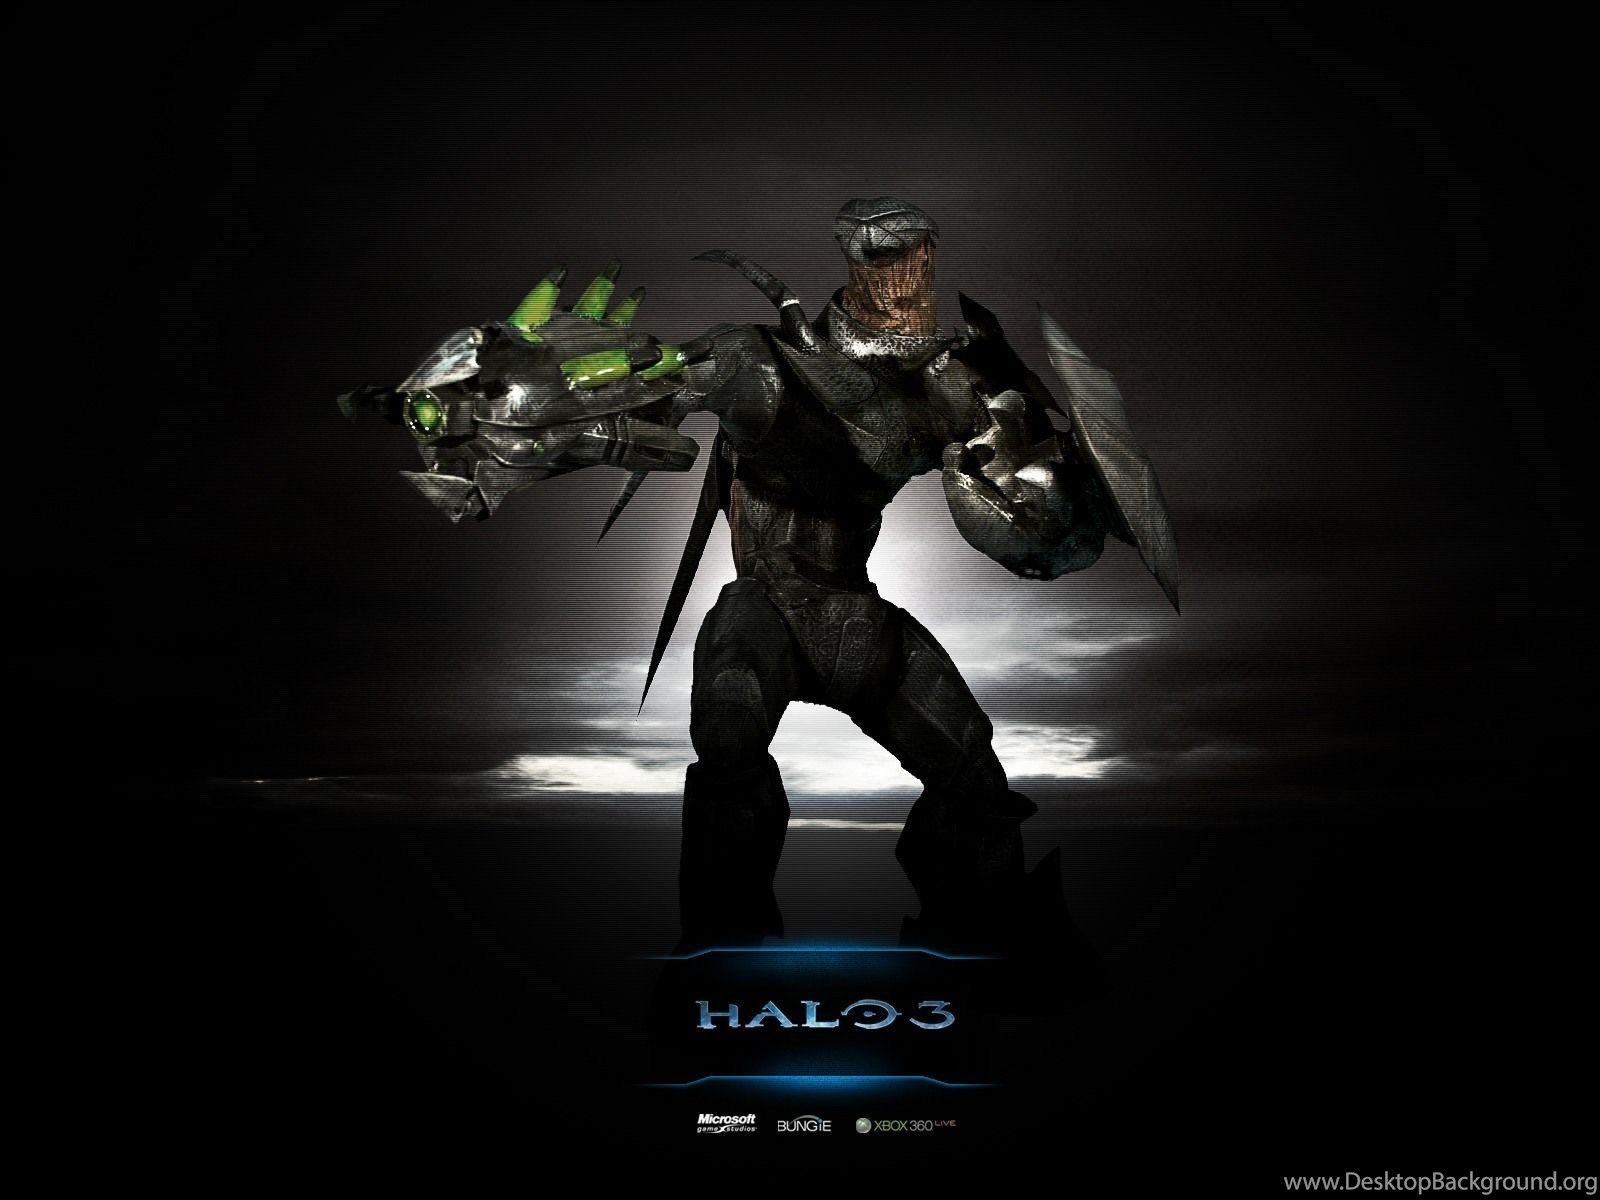 Desktop Wallpapers Halo 3 Games Desktop Background